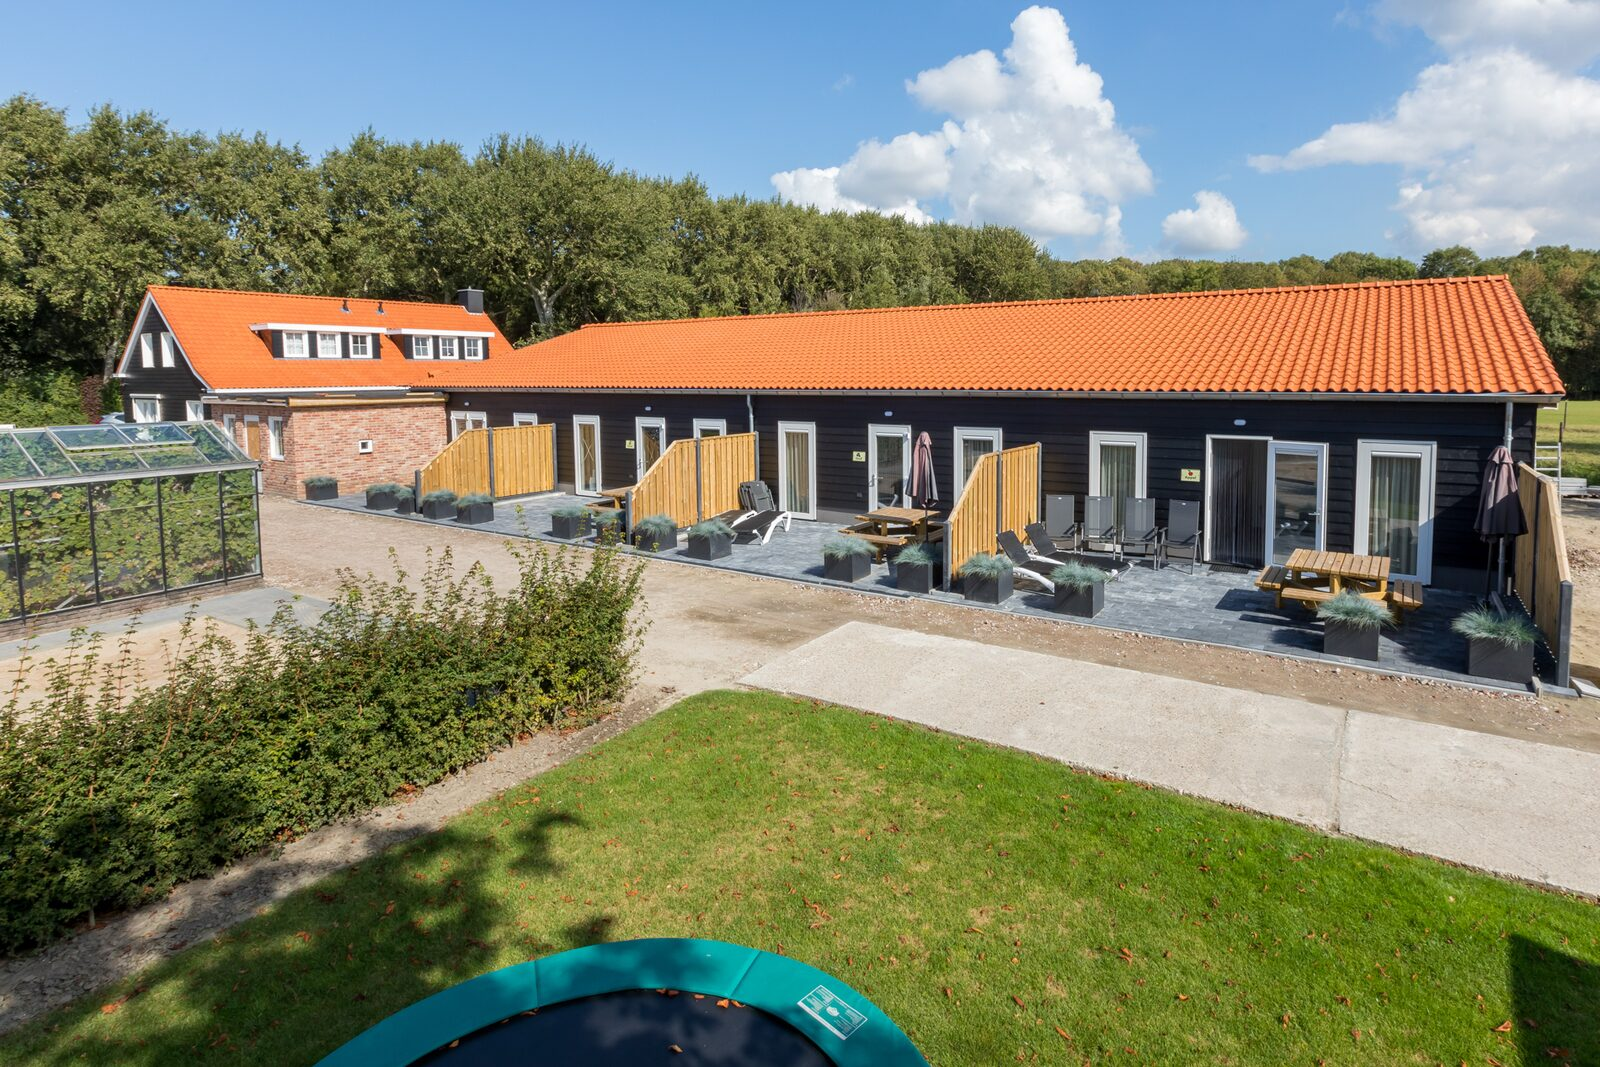 "Ferienhaus - Aagtekerkseweg 1 | Oostkapelle ""Vijg, Druif, Perzik of Appel"""